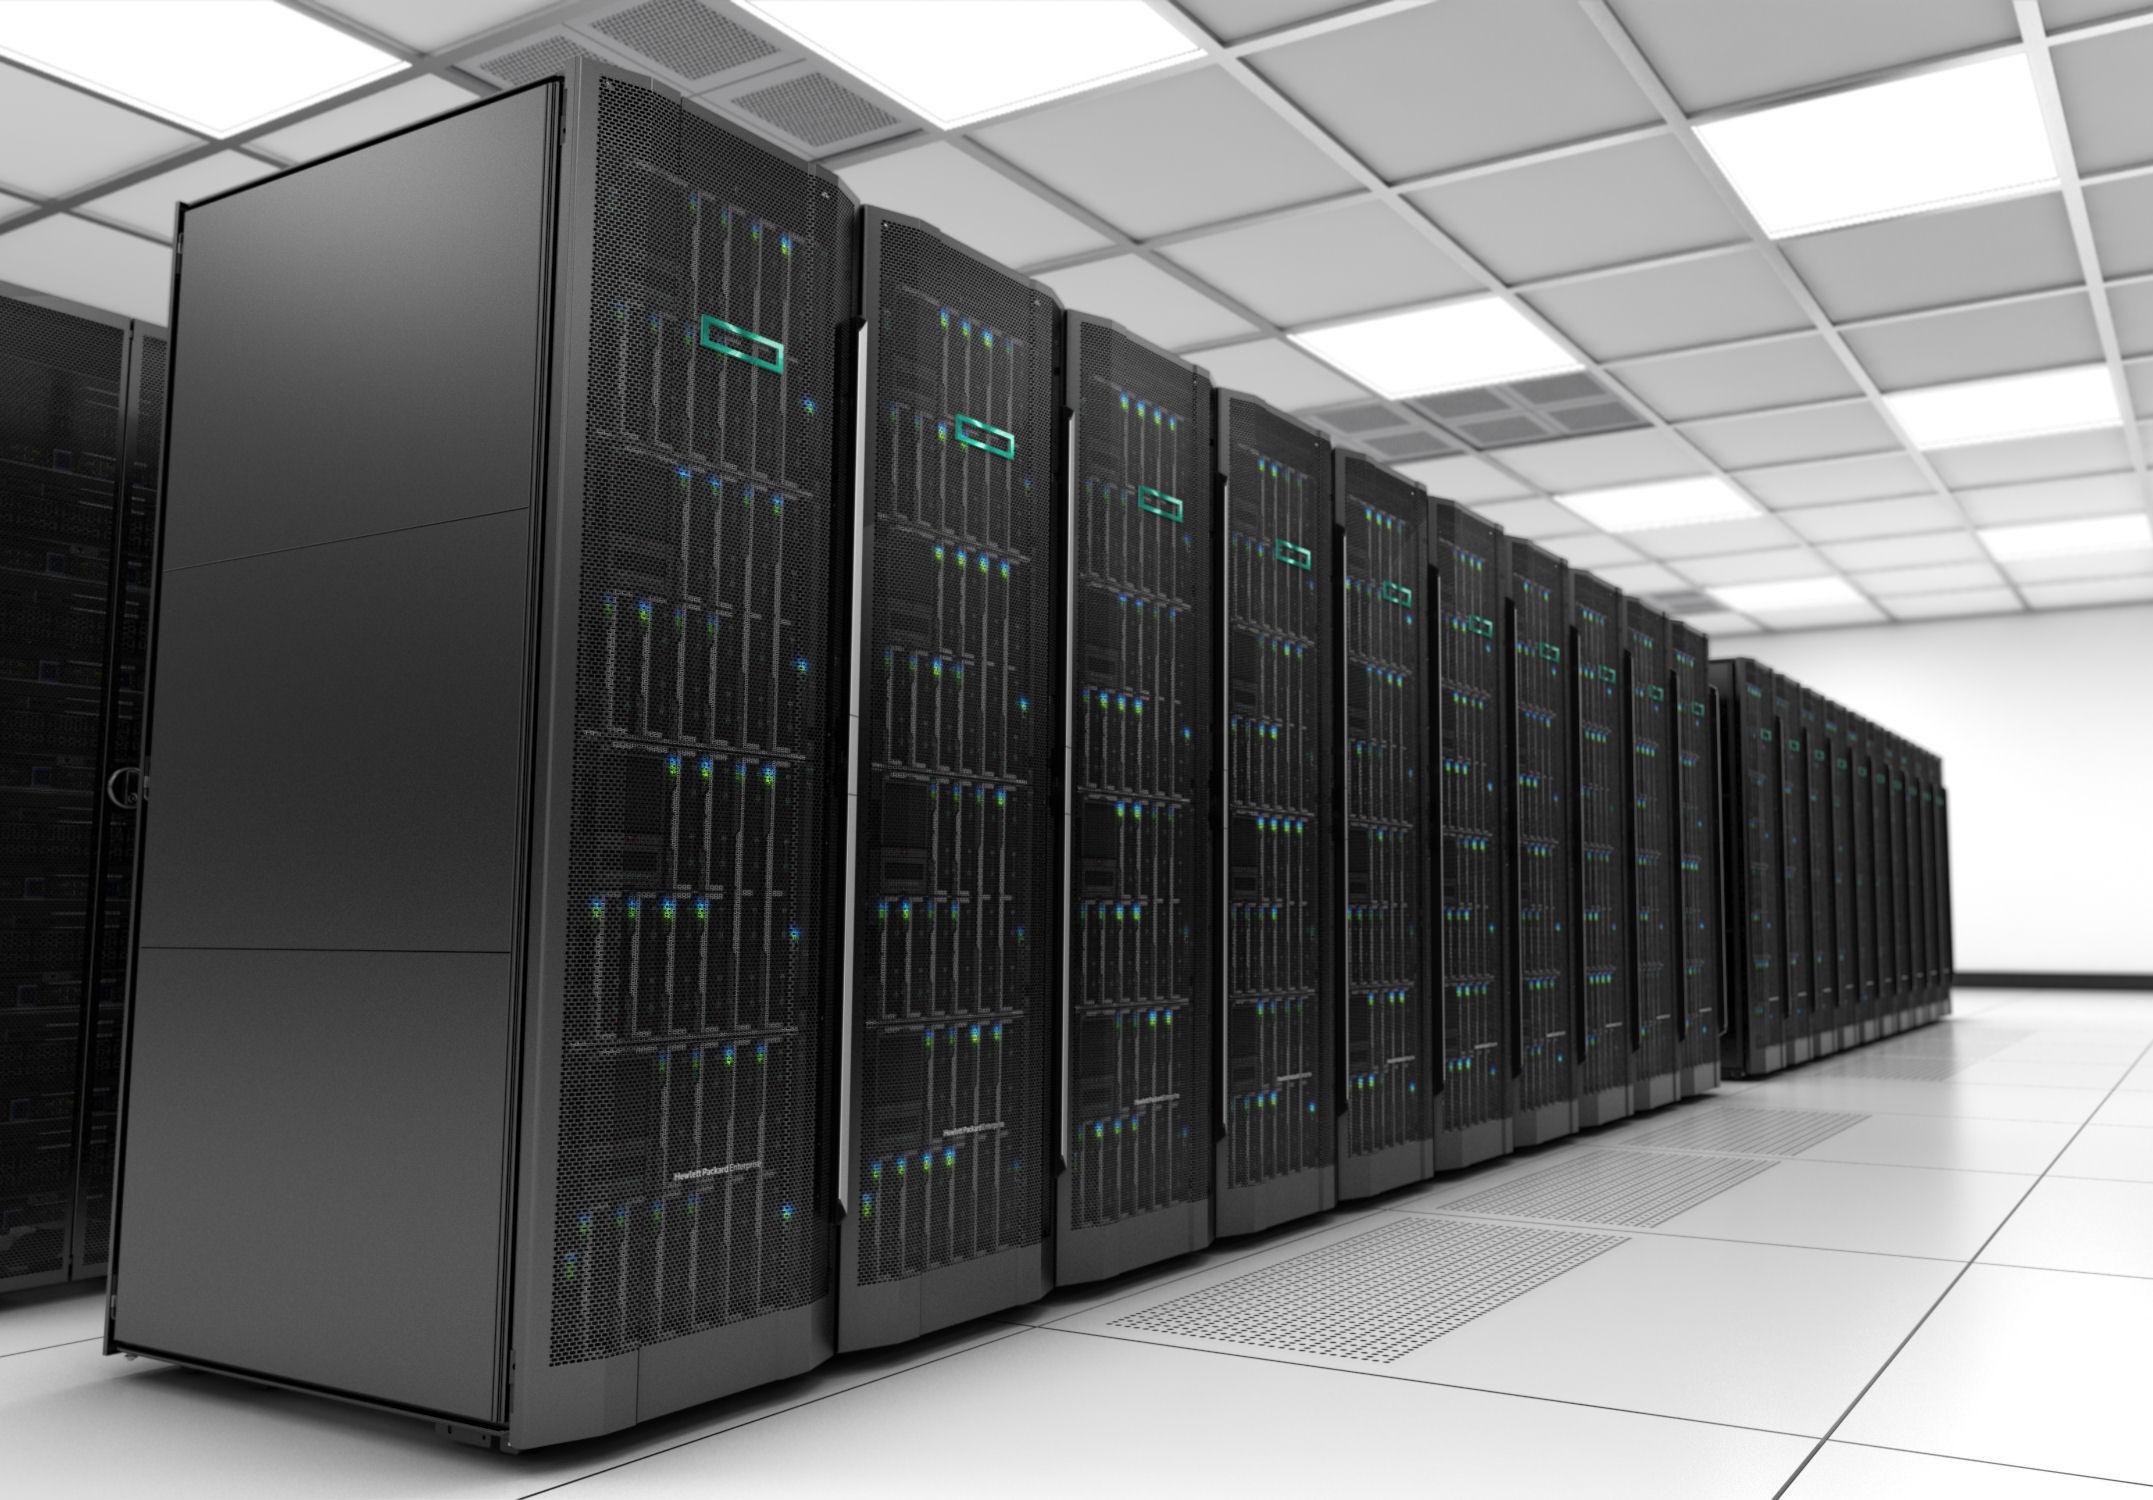 Smarter Rack Infrastructure Solutions Mean Smarter Business